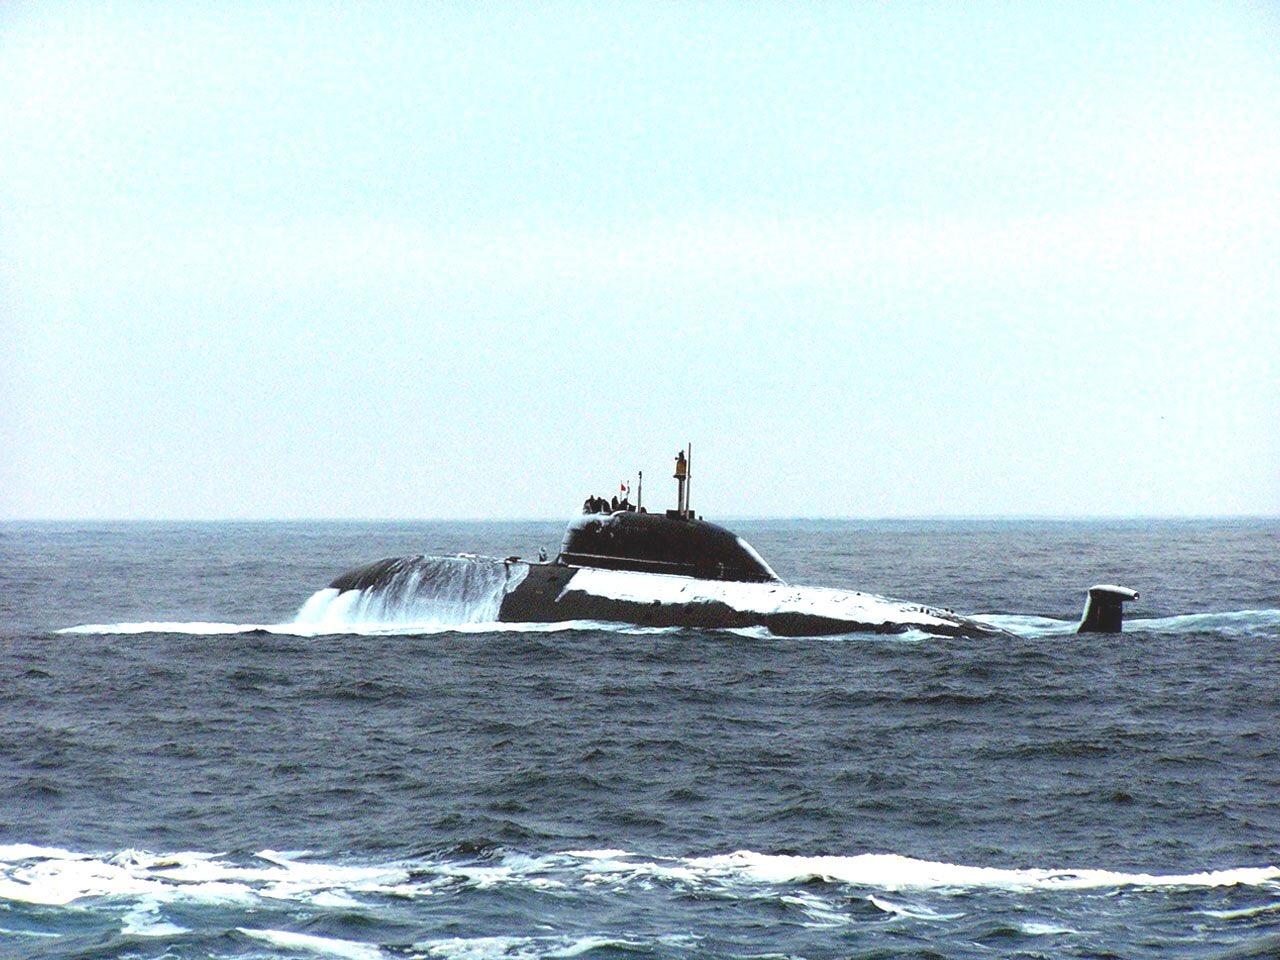 https://www.navalnews.com/wp-content/uploads/2020/03/Vepr-K-157-Akula-class-Submarine-Russia.jpg